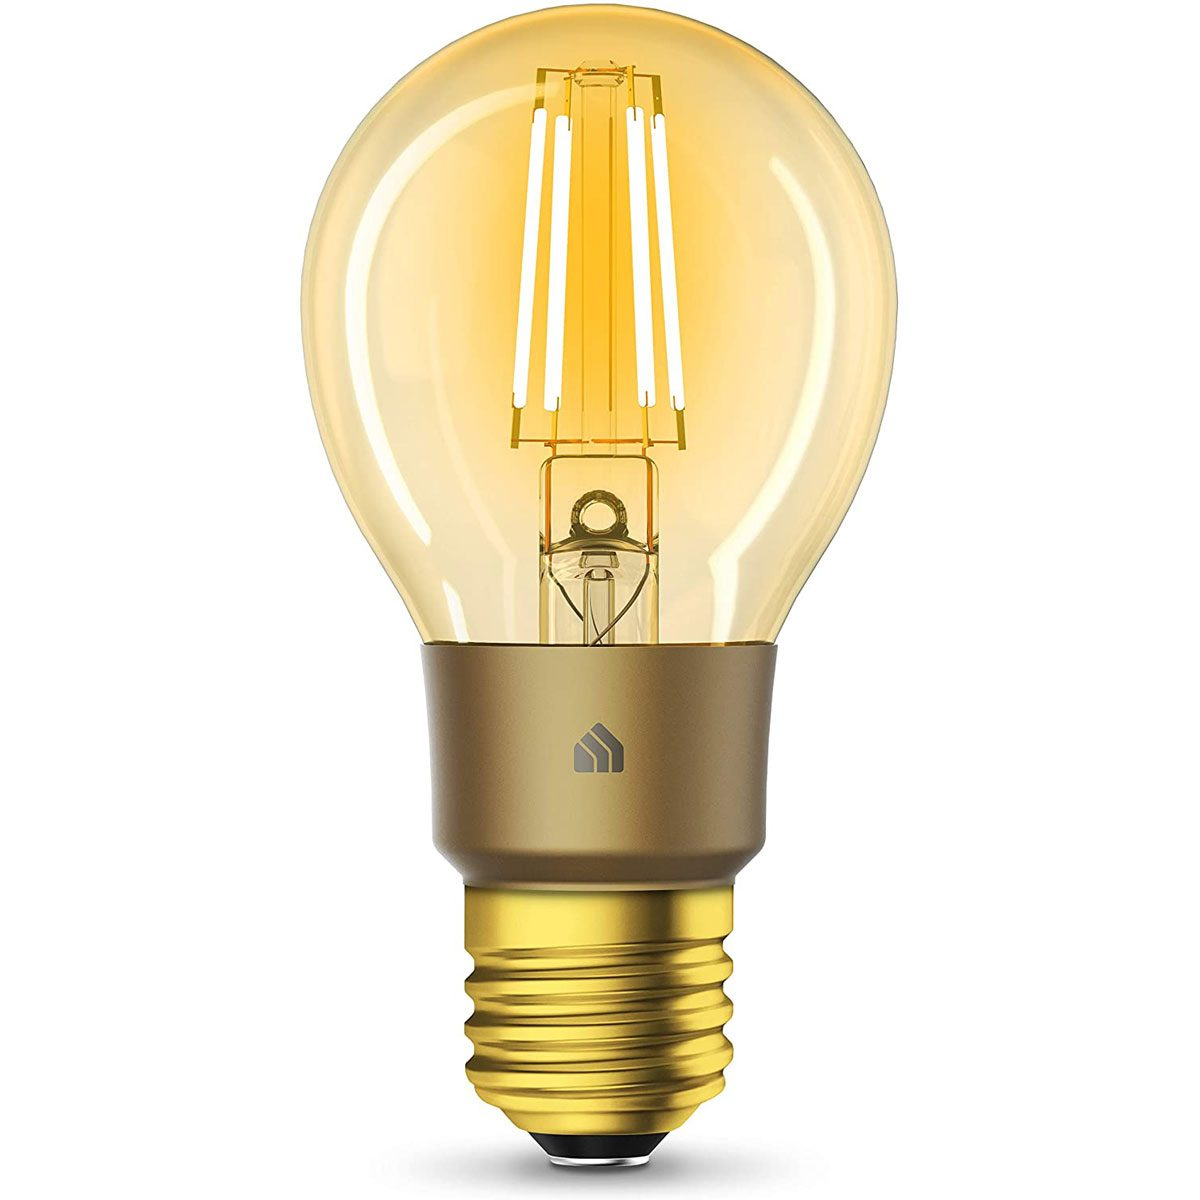 Kasa smart bulb